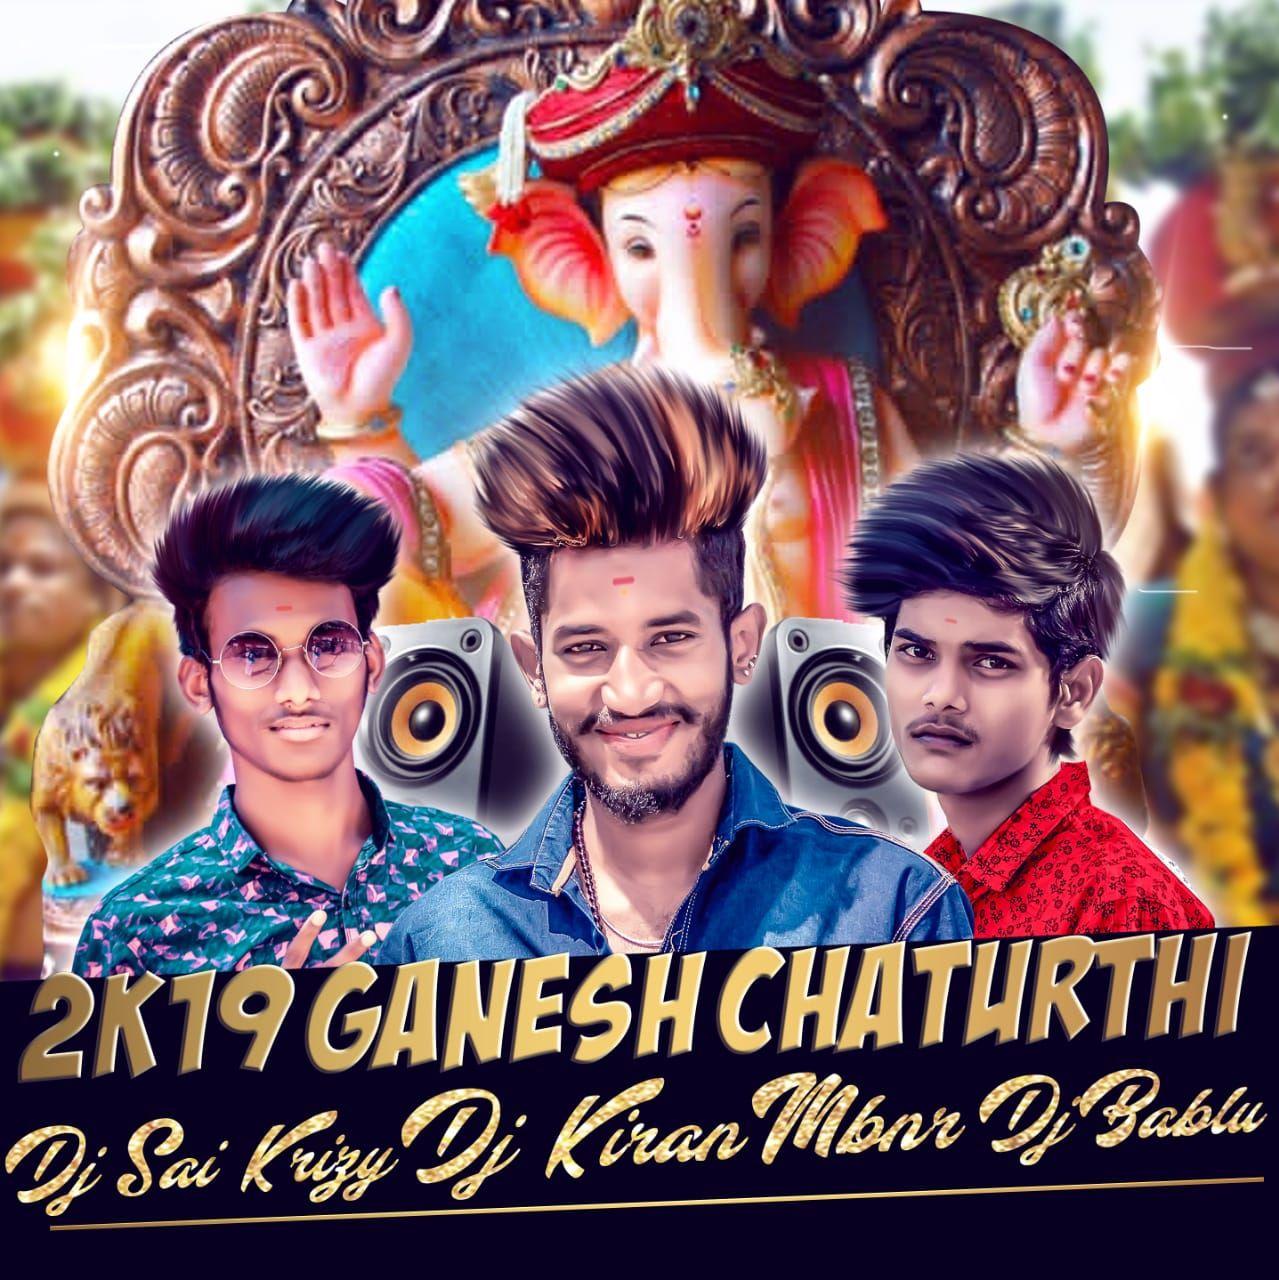 Hyderabad Bonalu Spl Mix S Dj Anil Newdjsworld In Telugu Dj Mp3 Songs 2019 Download Telugu Folk Songs Bathukamma New Dj Song Remix Music Dj Remix Songs